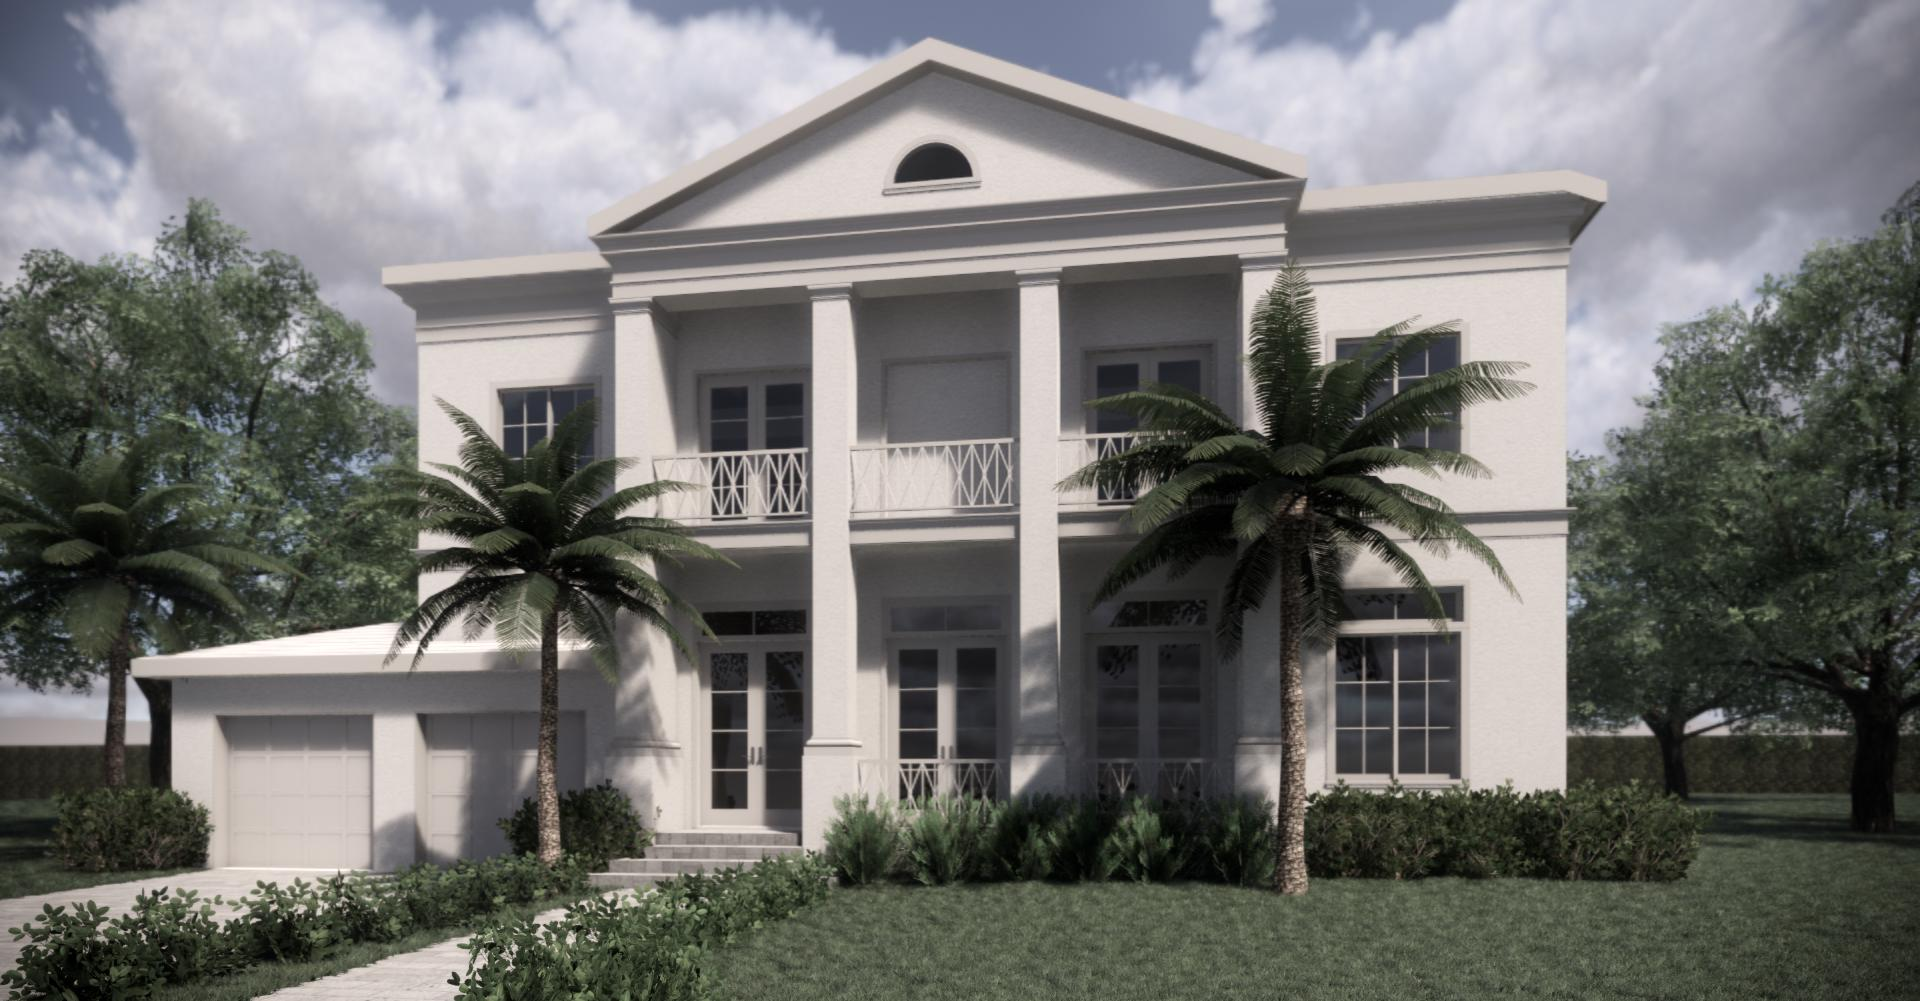 Details for 114 Summa Street, West Palm Beach, FL 33405